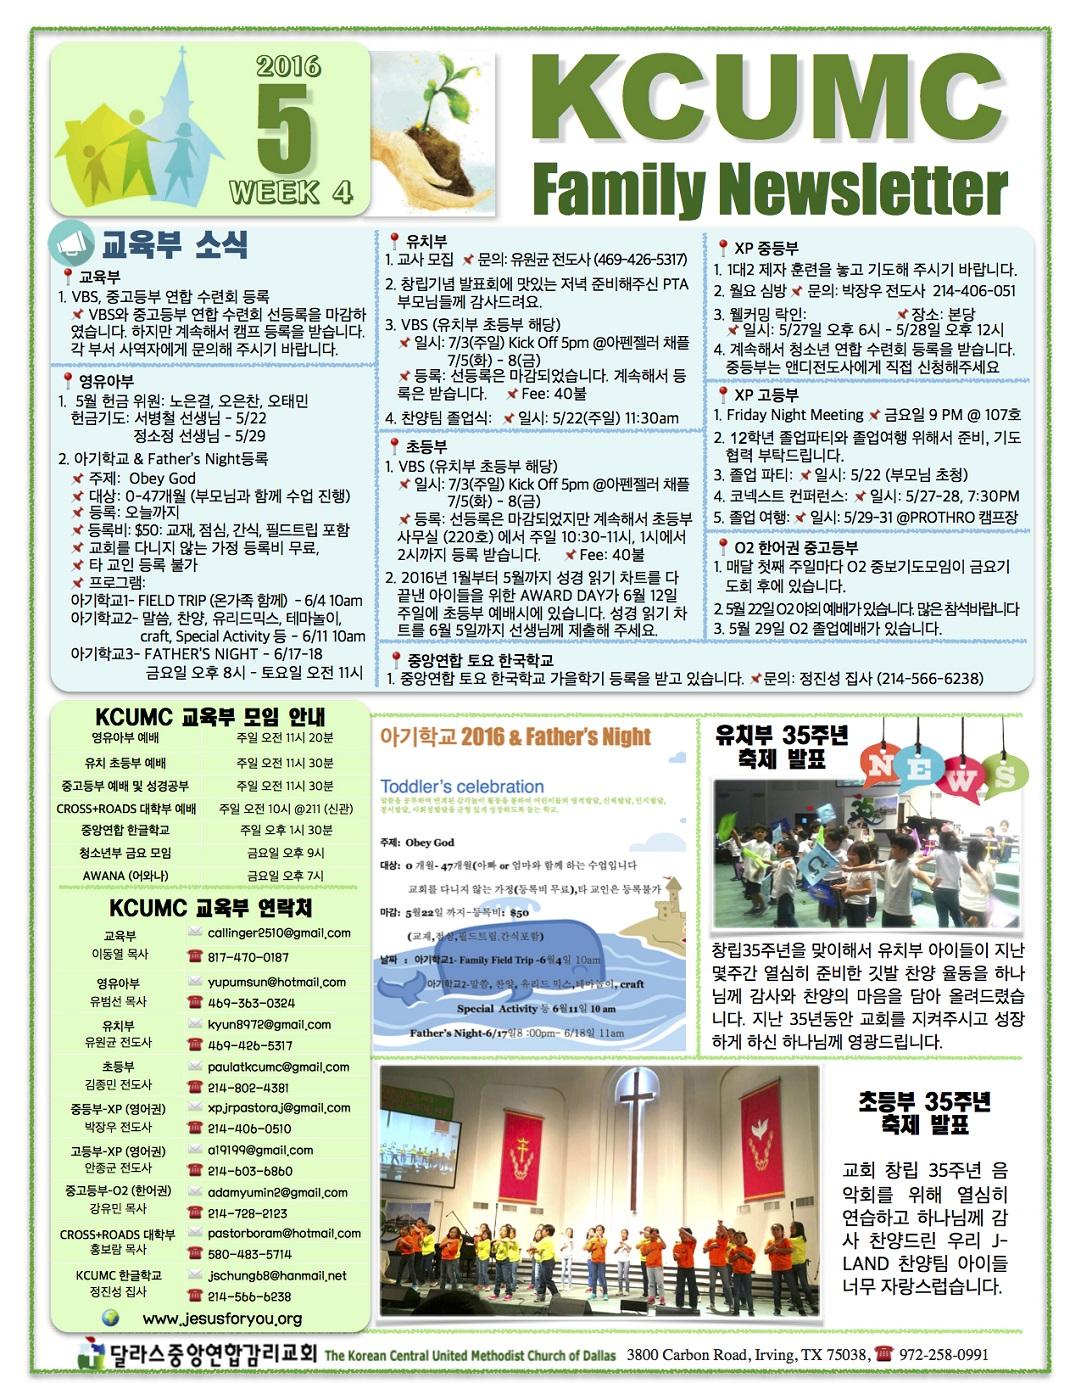 Newsletter 5월 4주 1